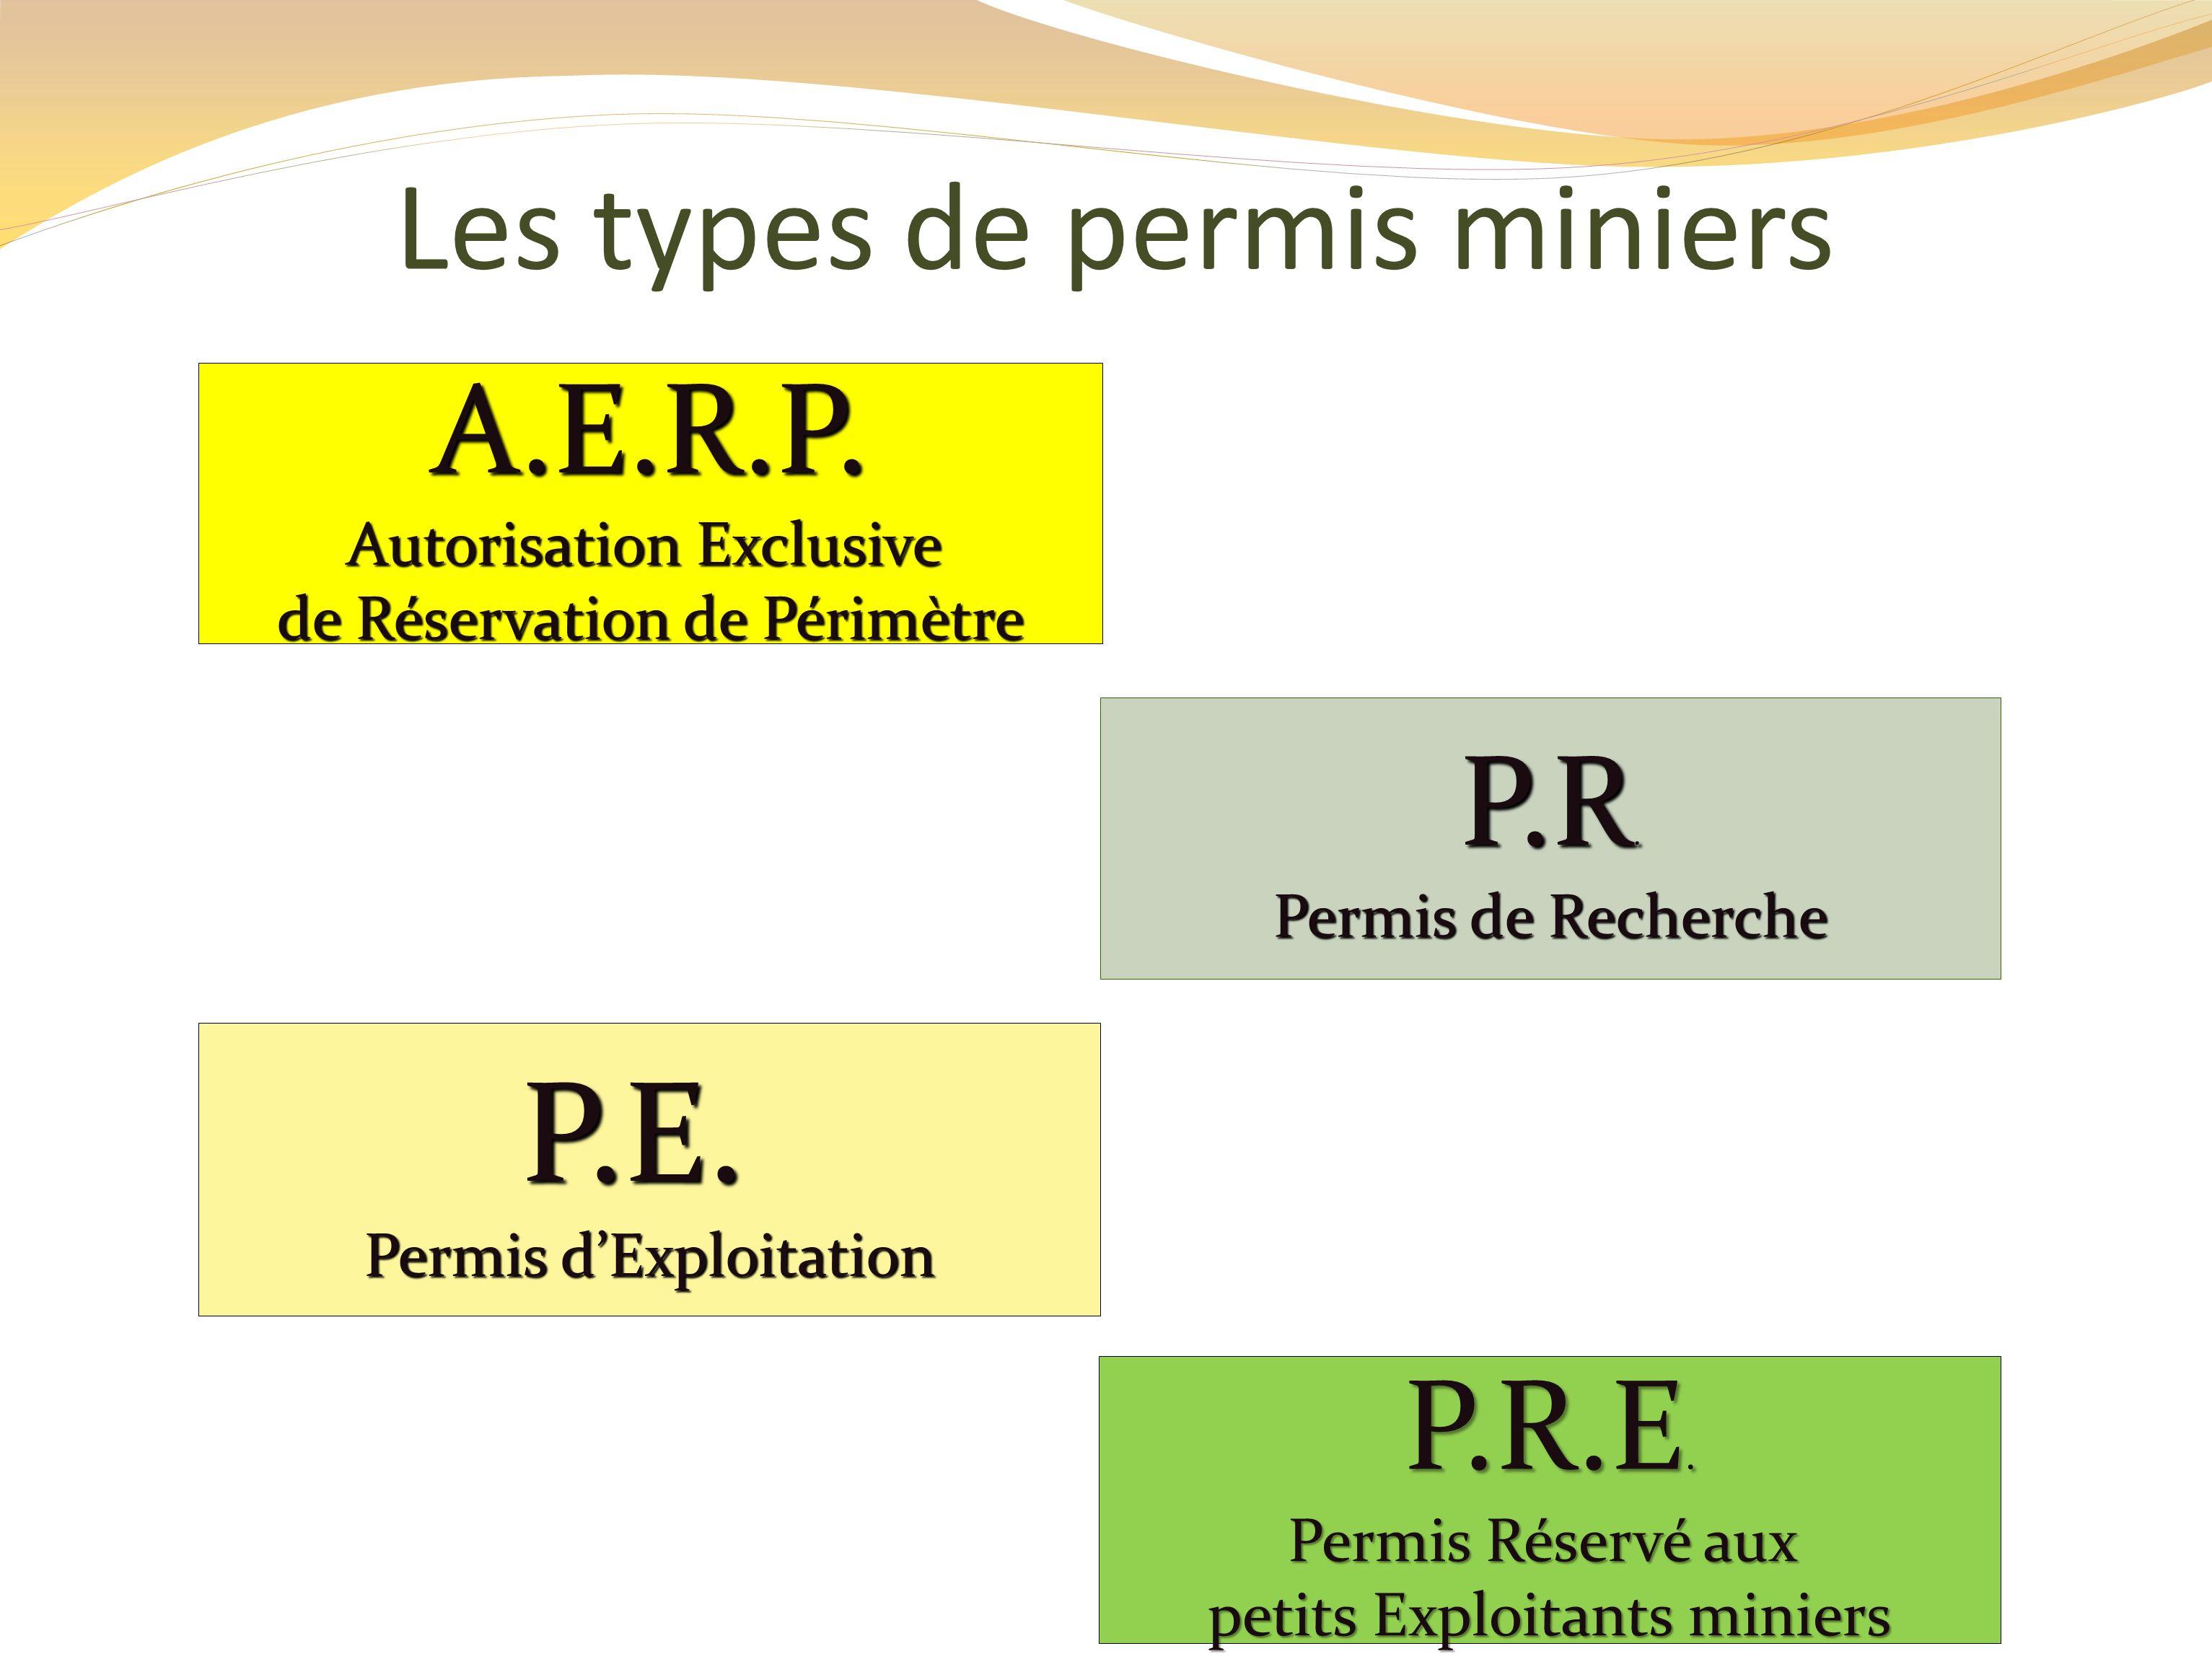 P.E. A.E.R.P. P.R. P.R.E. Les types de permis miniers